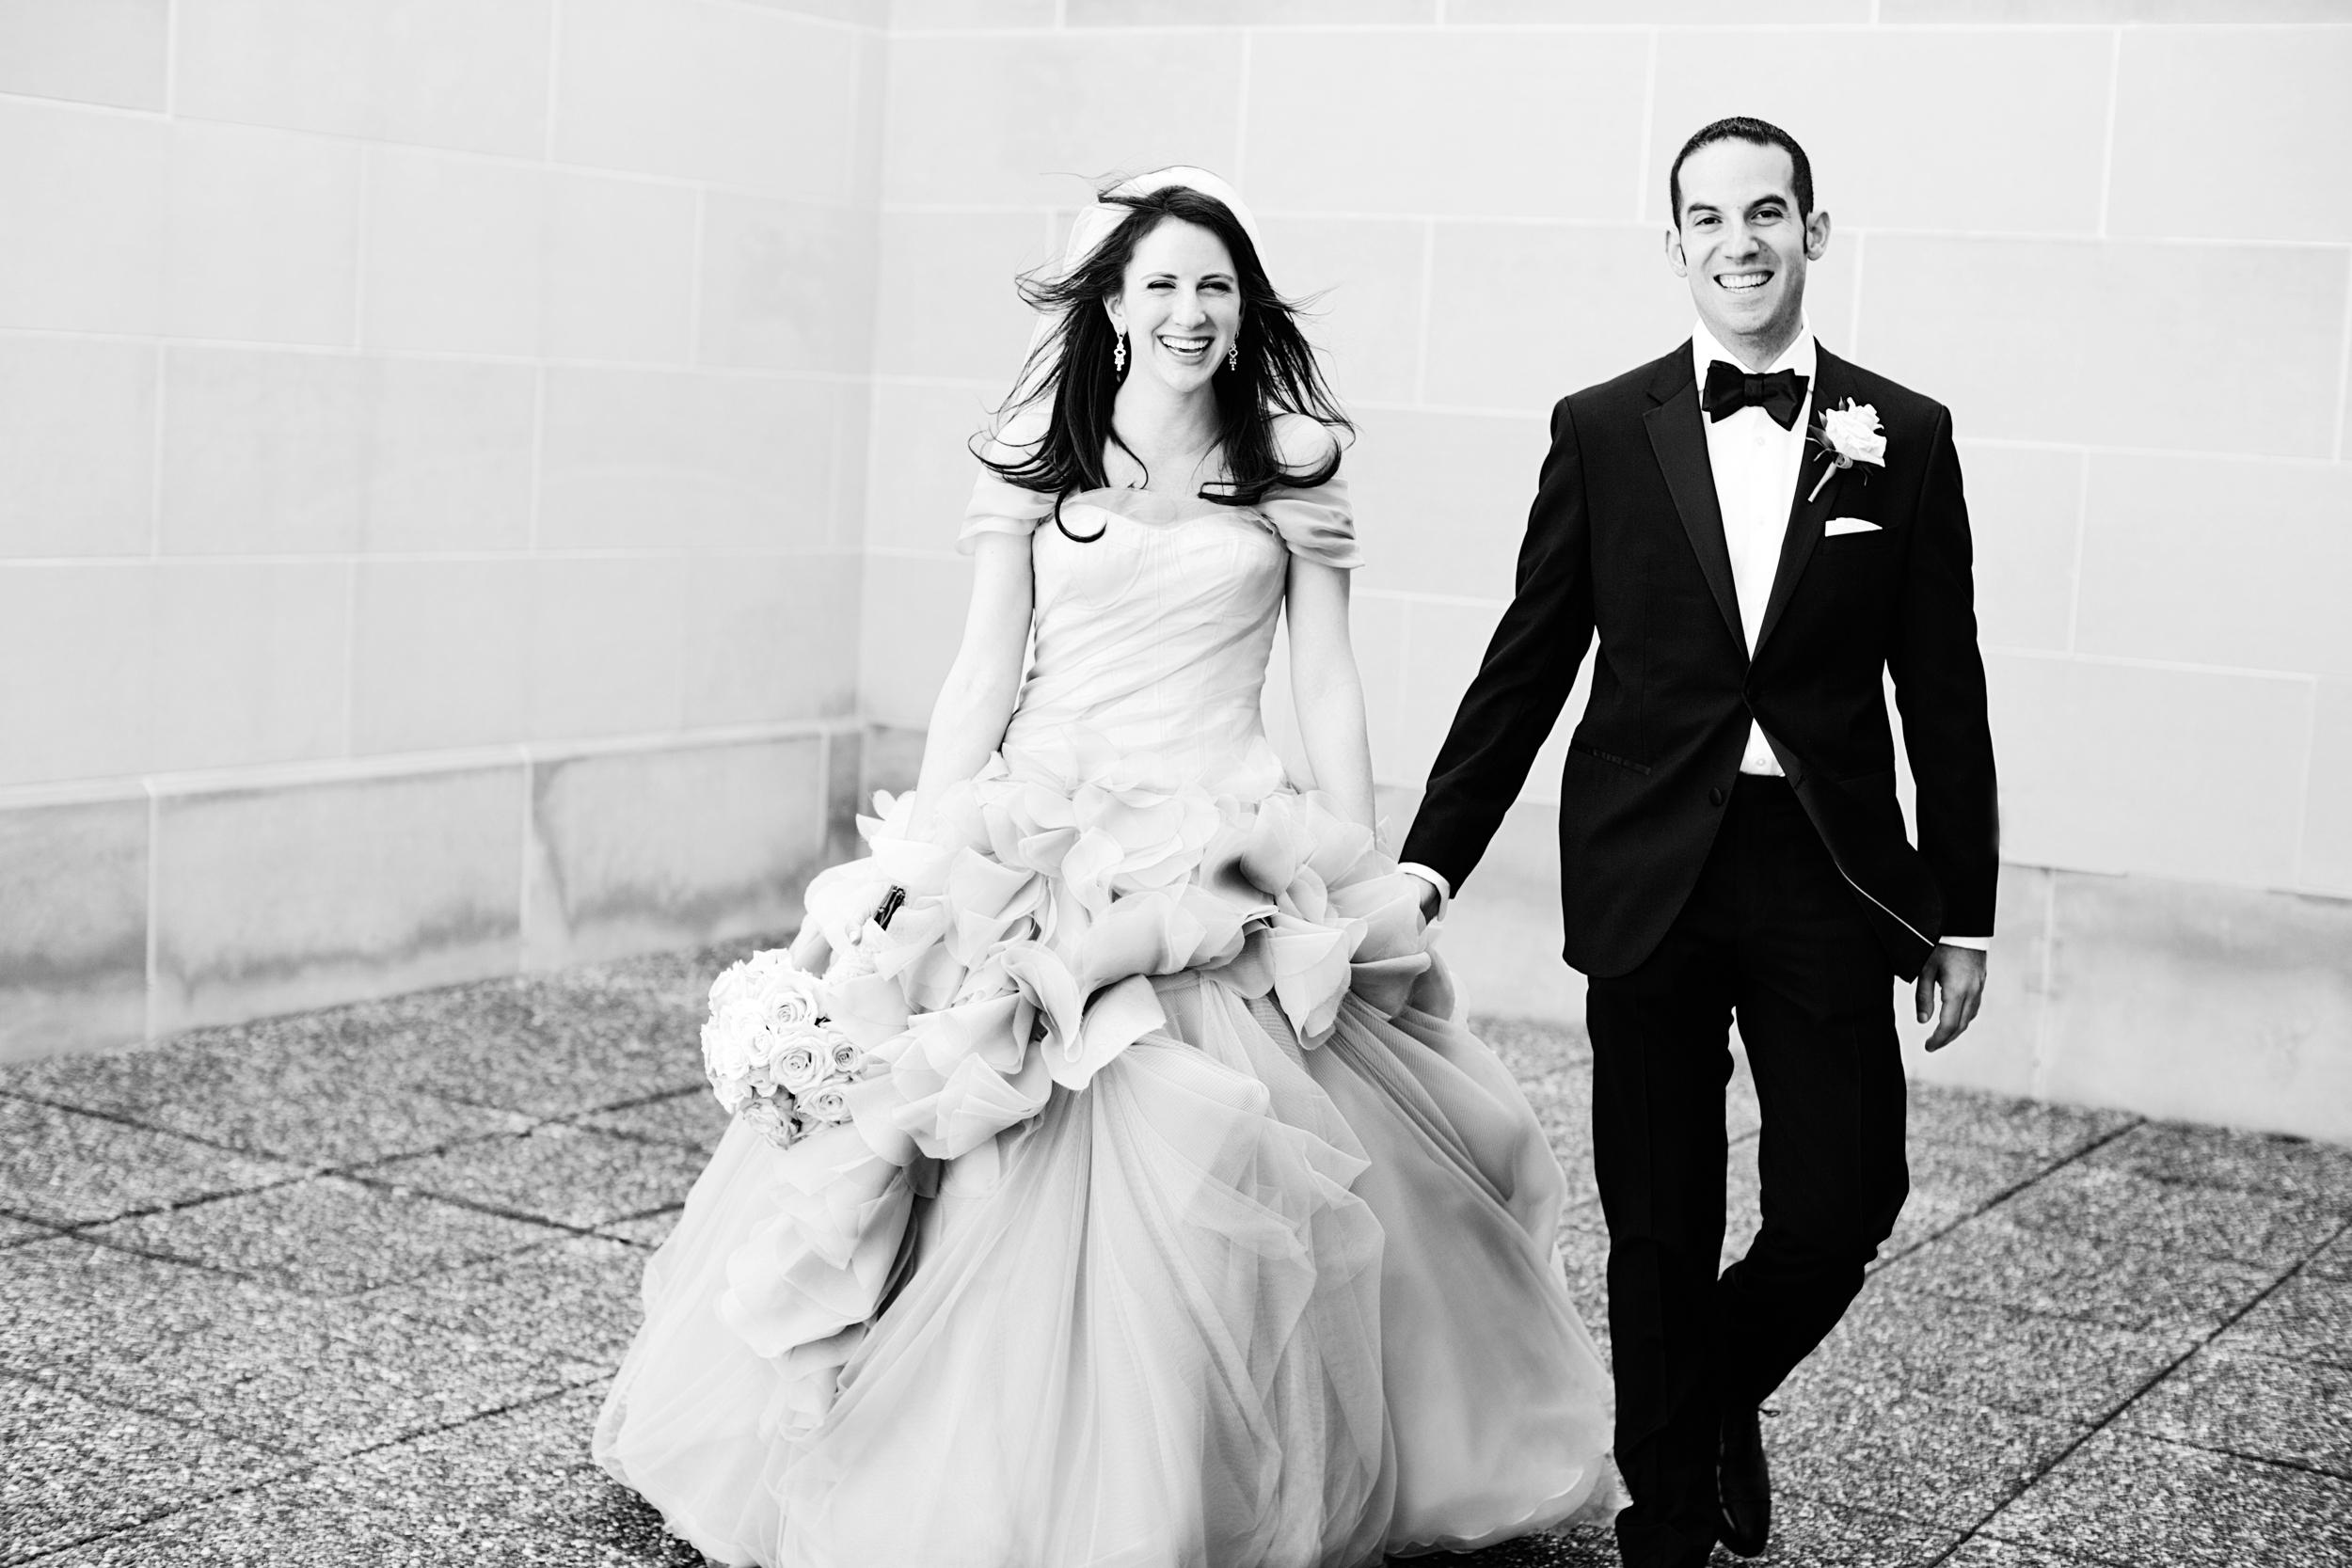 Ceci_New_York_Ceci_Style_Ceci_Johnson_Luxury_Lifestyle_Floral_Lace_Wedding_Letterpress_Inspiration_Design_Custom_Couture_Personalized_Invitations_-56.jpg